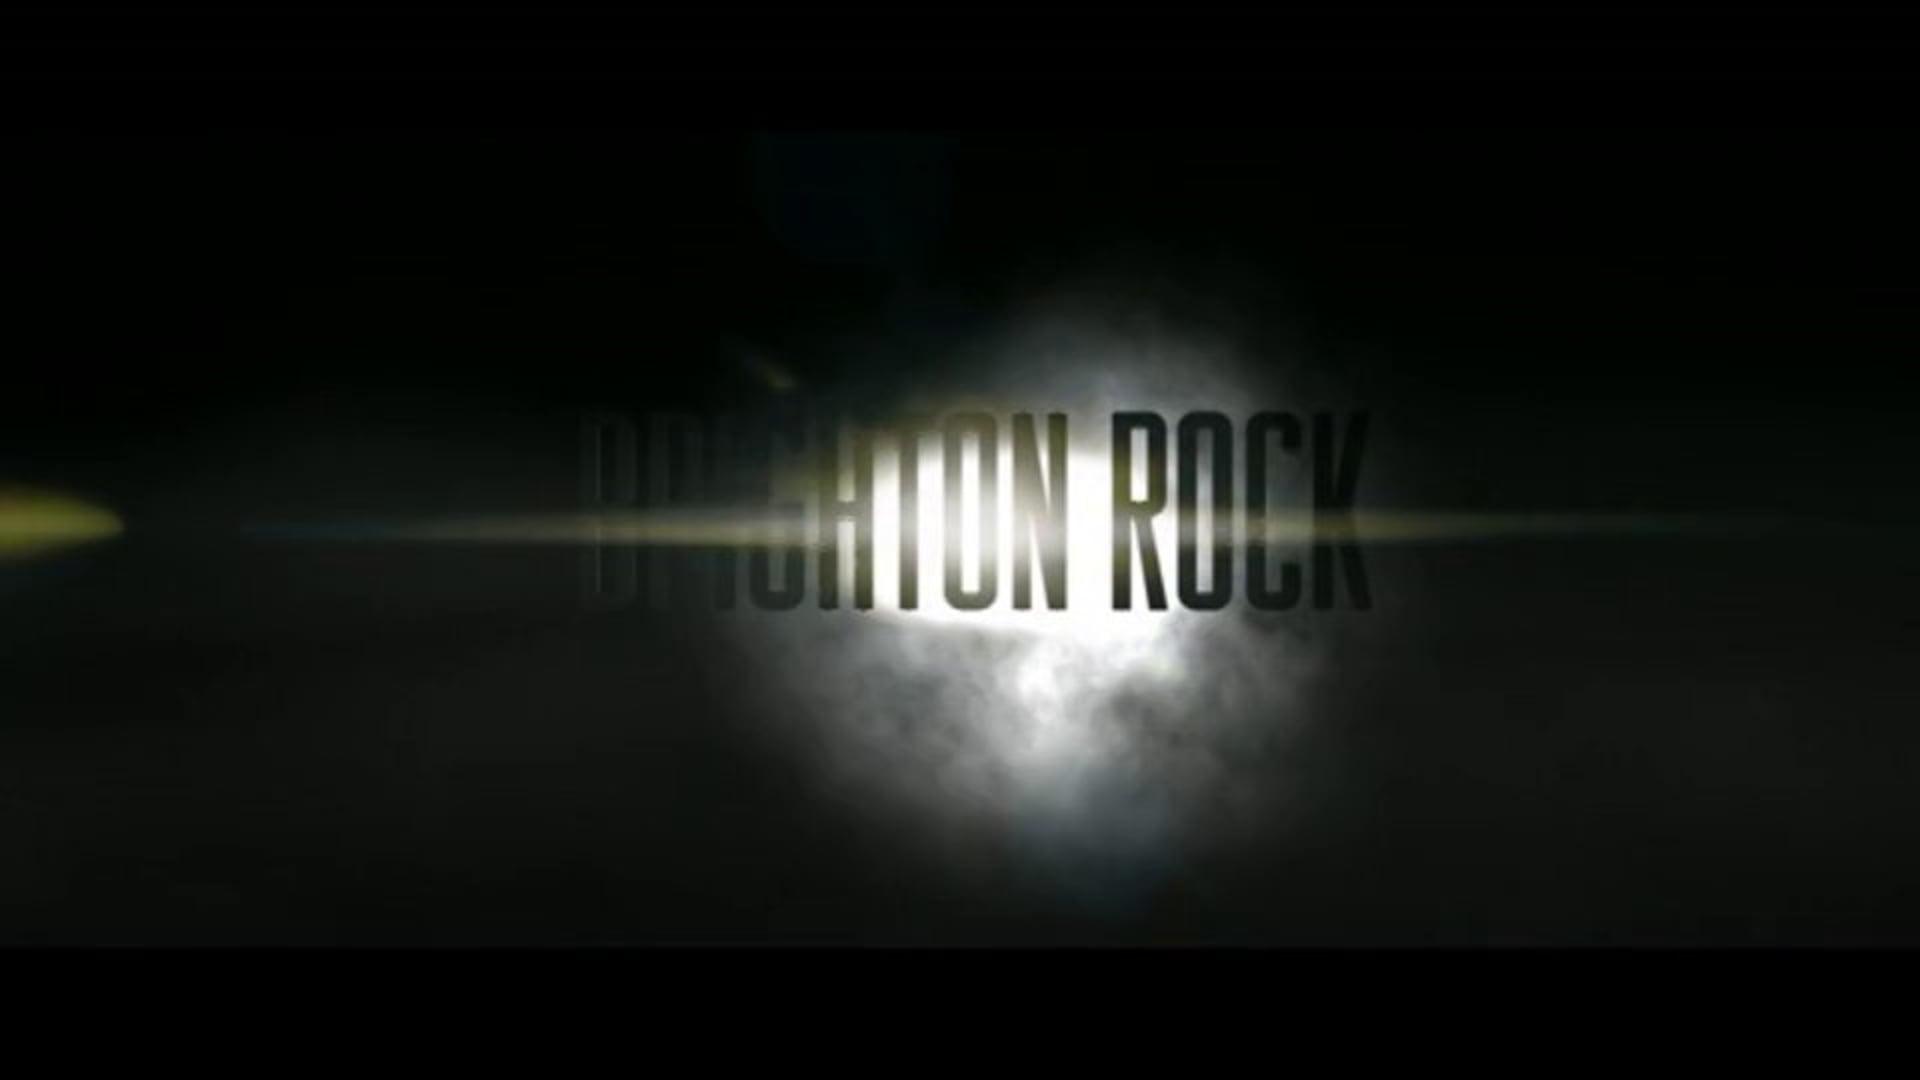 Brighton Rock - feature film opening titles